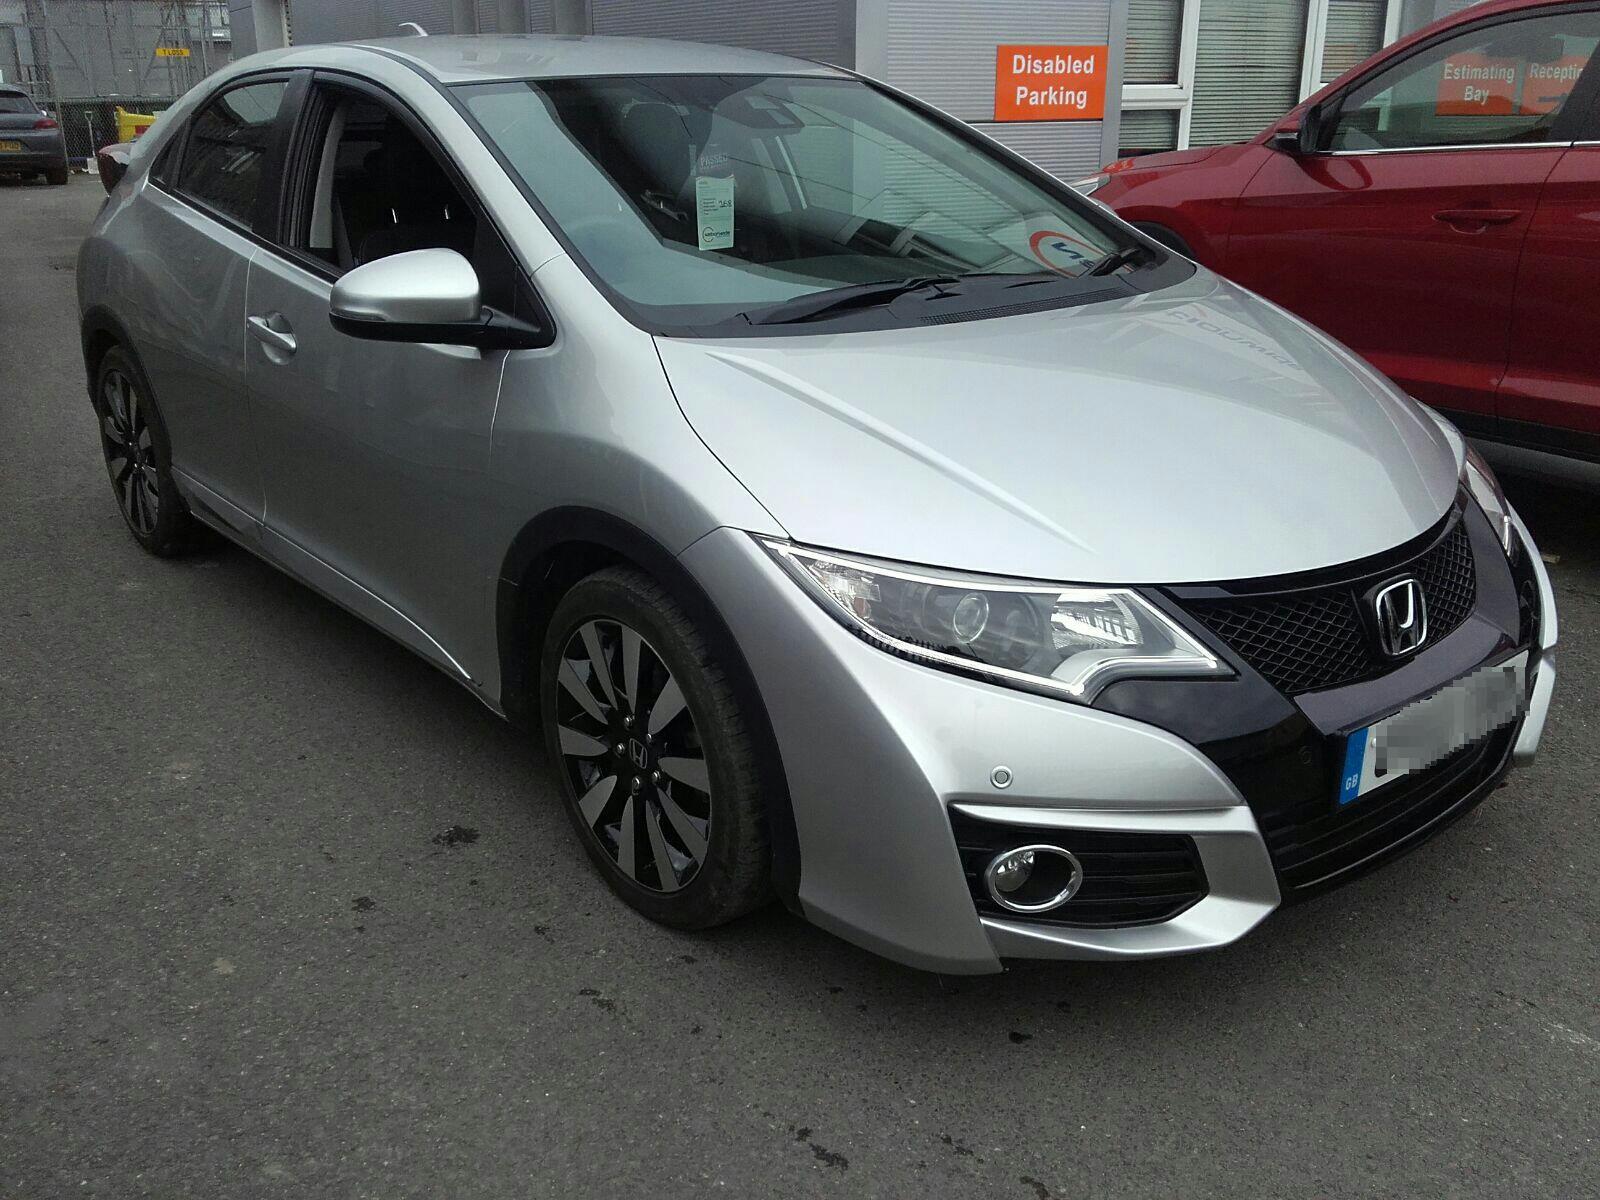 Honda Civic 2015 To 2017 SE Plus i-VTEC Seat Belt Rear Stalk LH